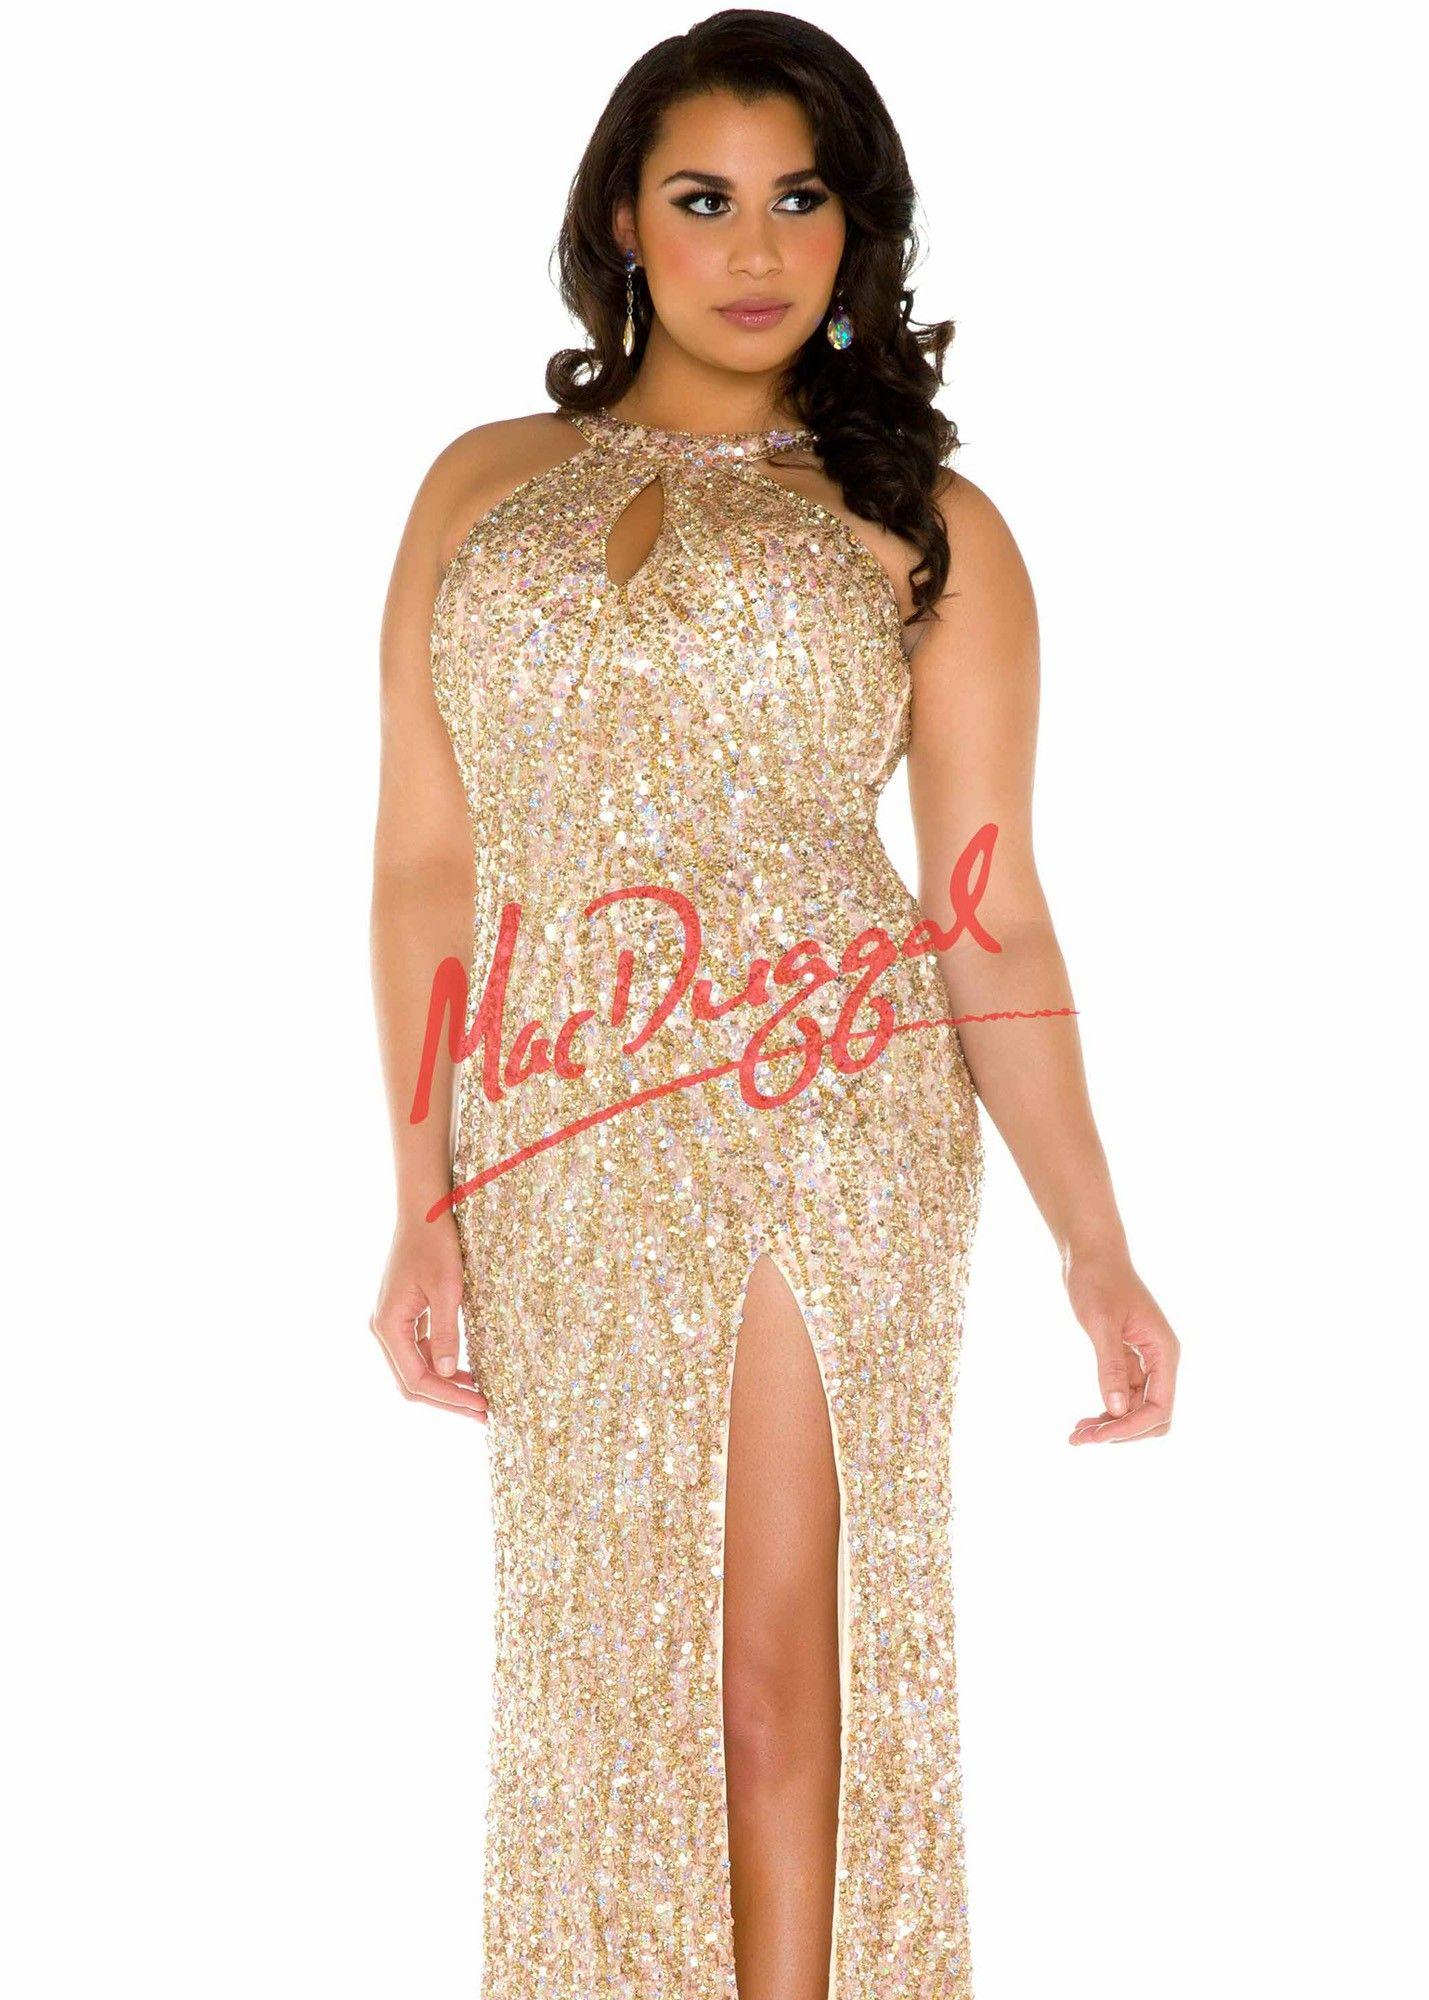 Royal Blue One Shoulder Plus Size Prom Dress.. i love this dress ...